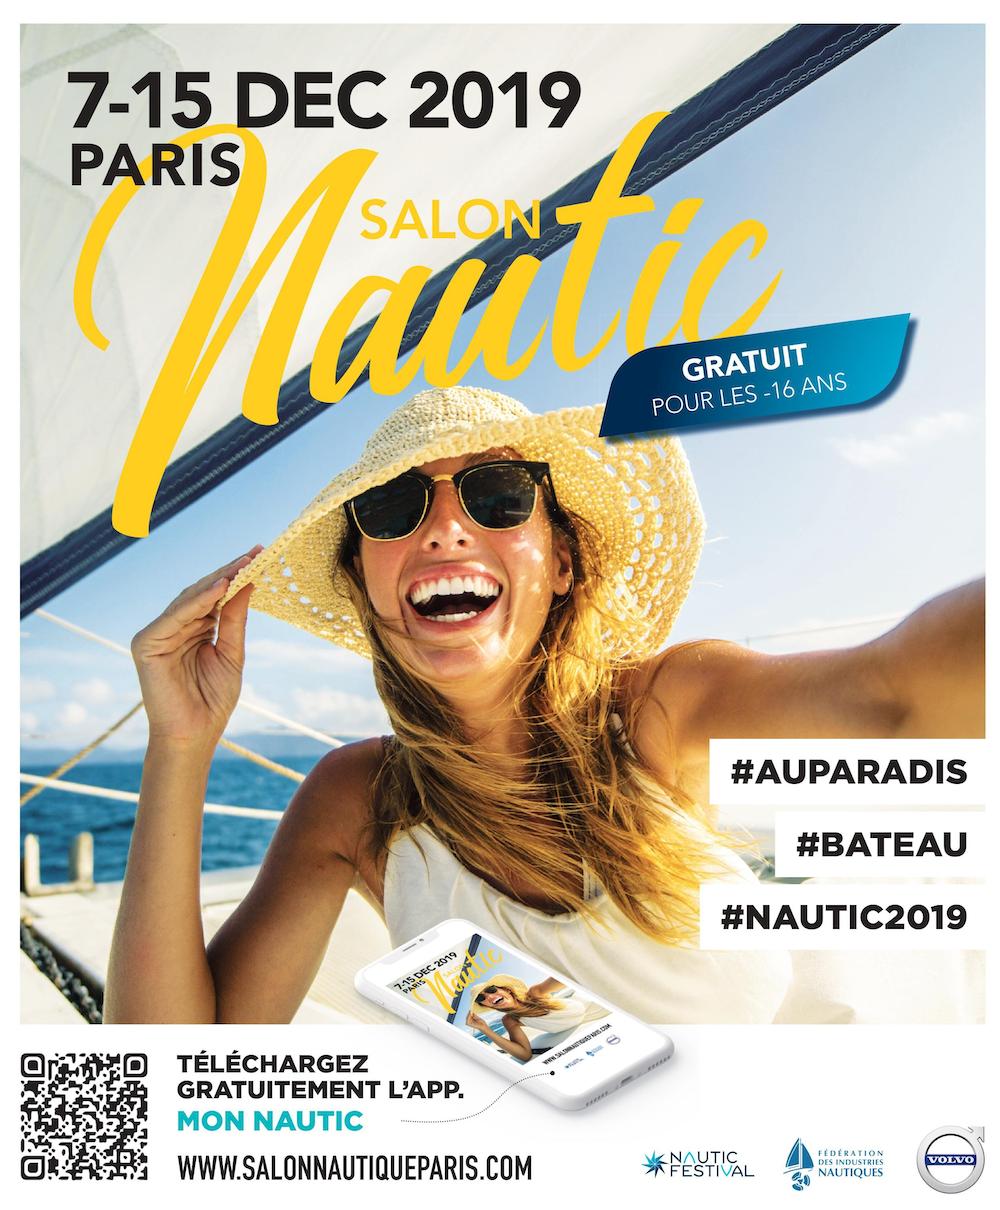 Salon nautique 2019, un bilan plutôt positif (article de Nautic News)